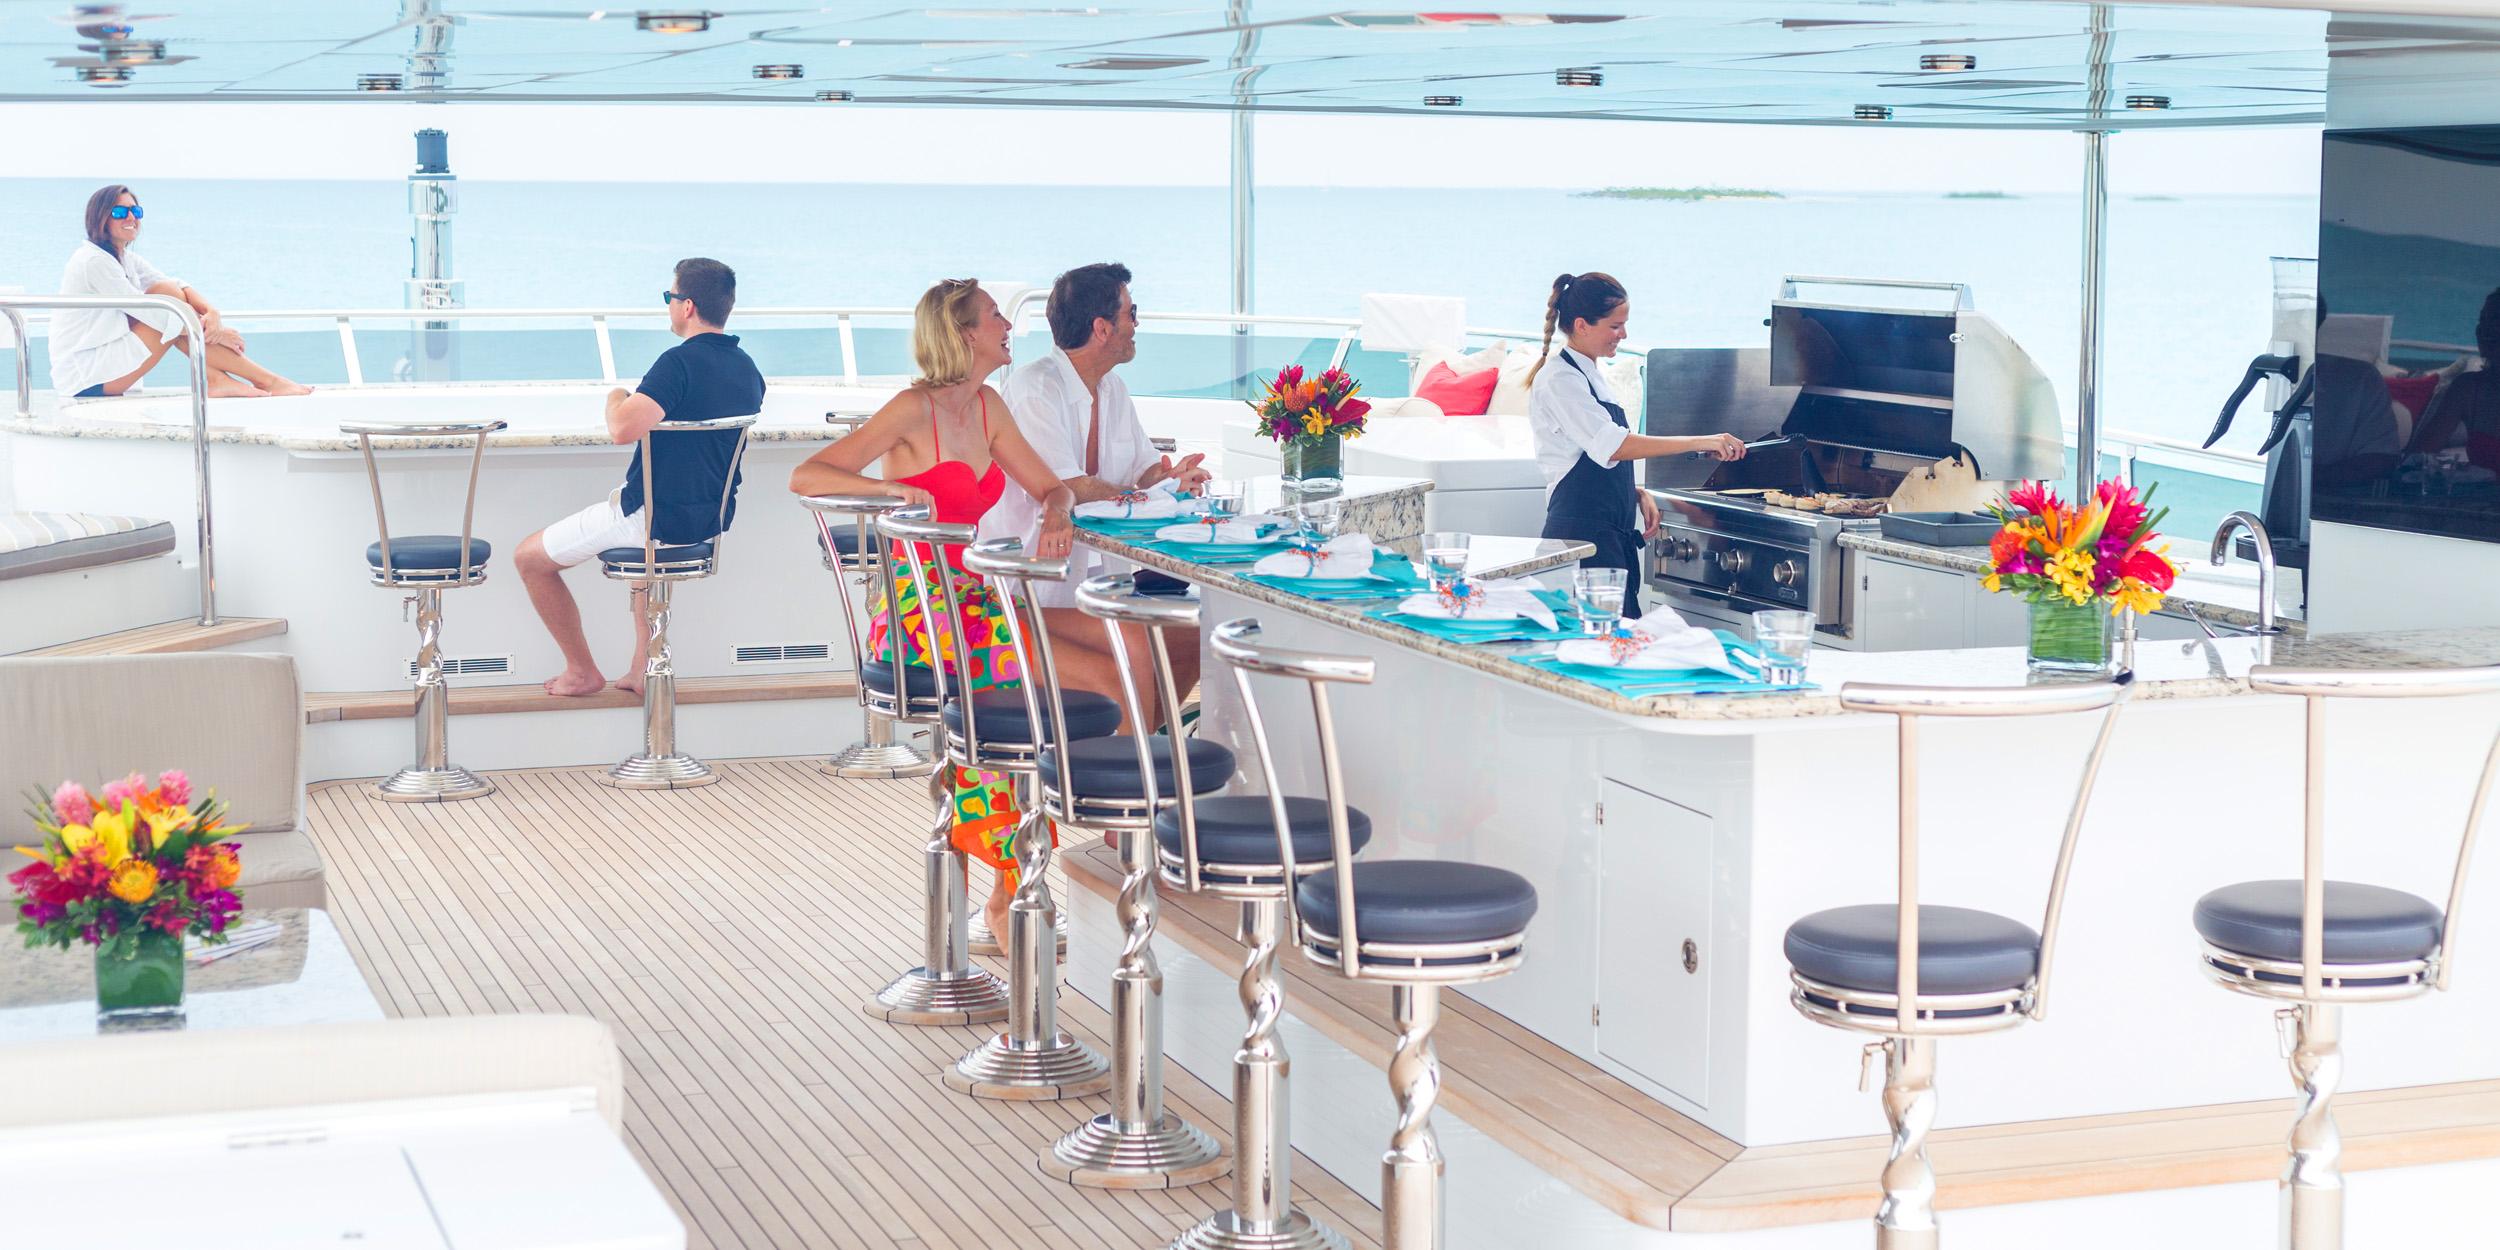 alquiler de yates en Ibiza. Alquiler de barcos en Ibiza. Alquiler de barcos baratos en Ibiza